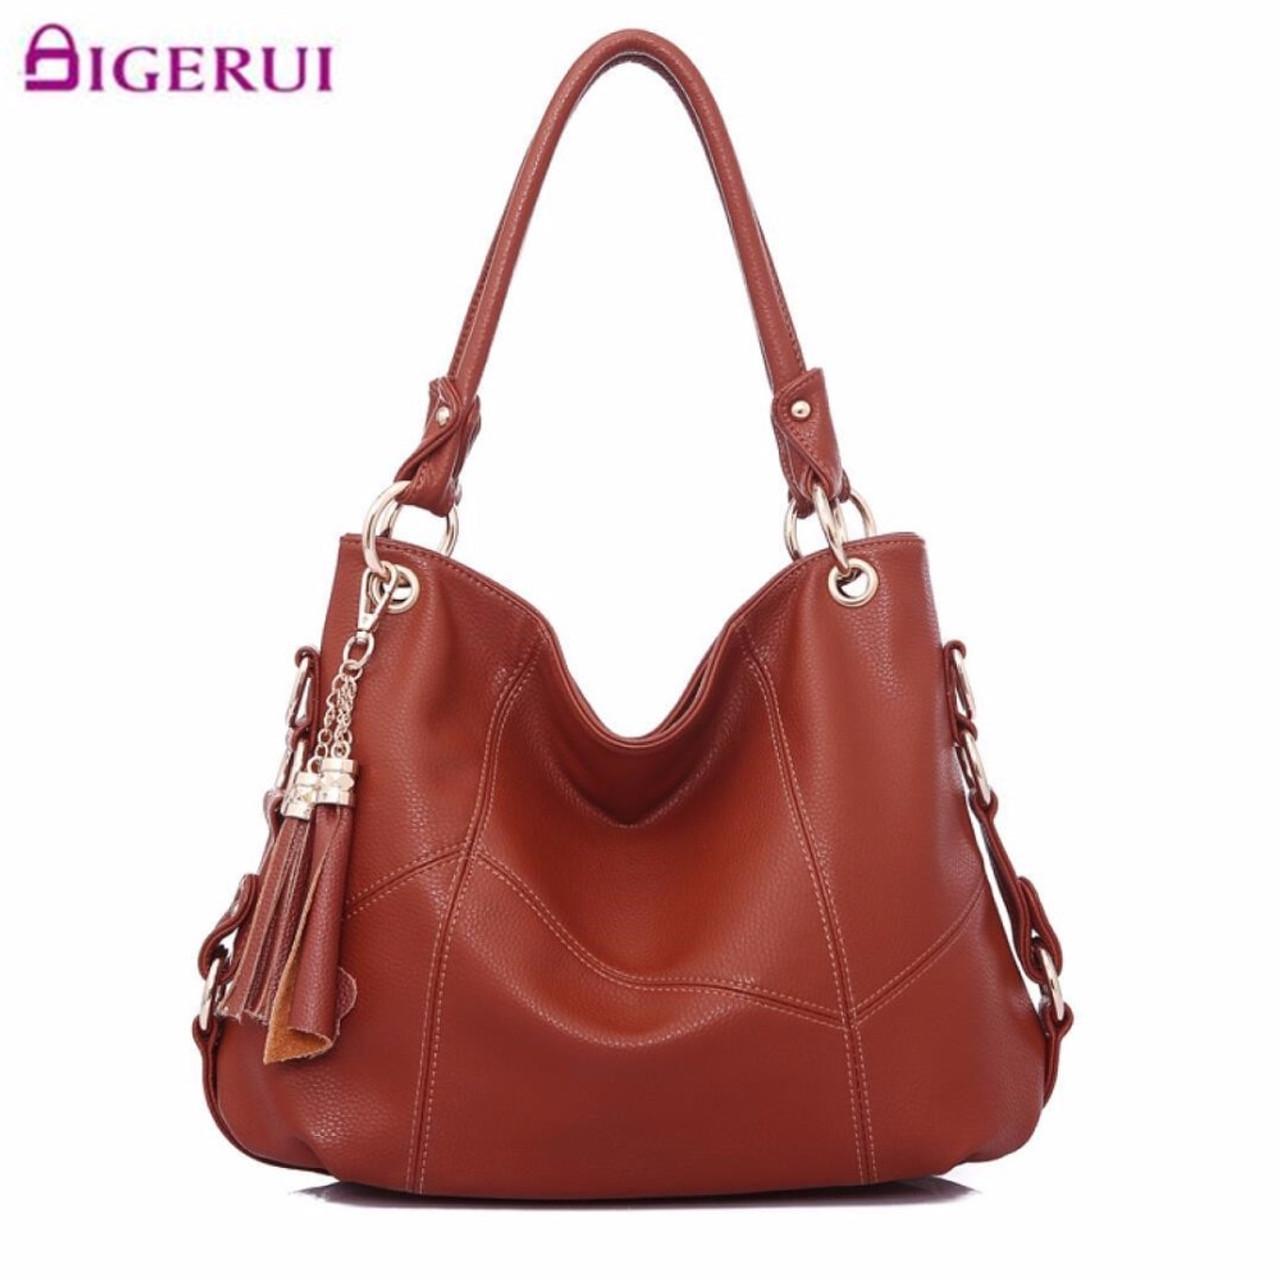 56a8af03d23e New Genuine Leather Tassel Handbag Women Messenger Bags Ladies Handbags  Women Shoulder Crossbody Bags Bolsa Feminina A119